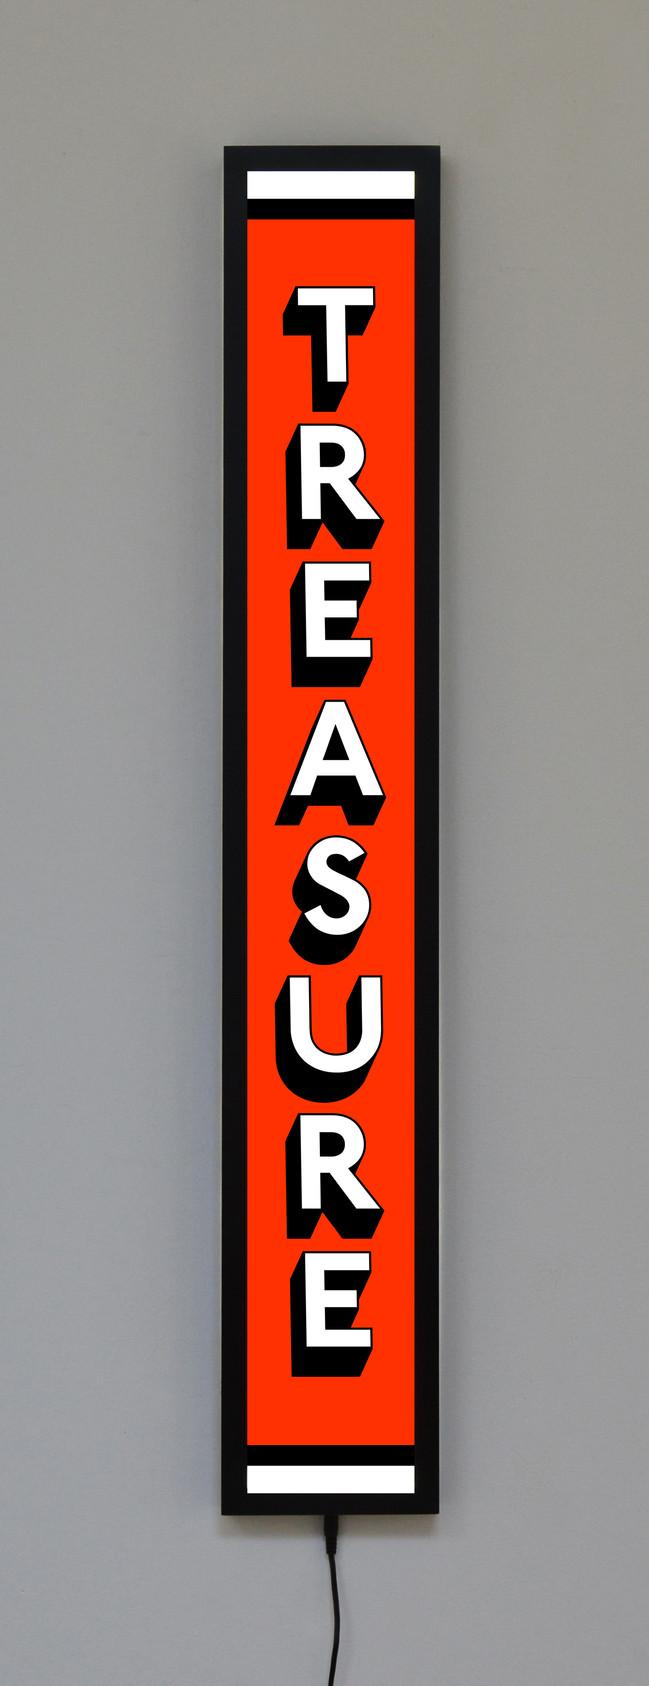 TREASURE_ME_(Small).jpg